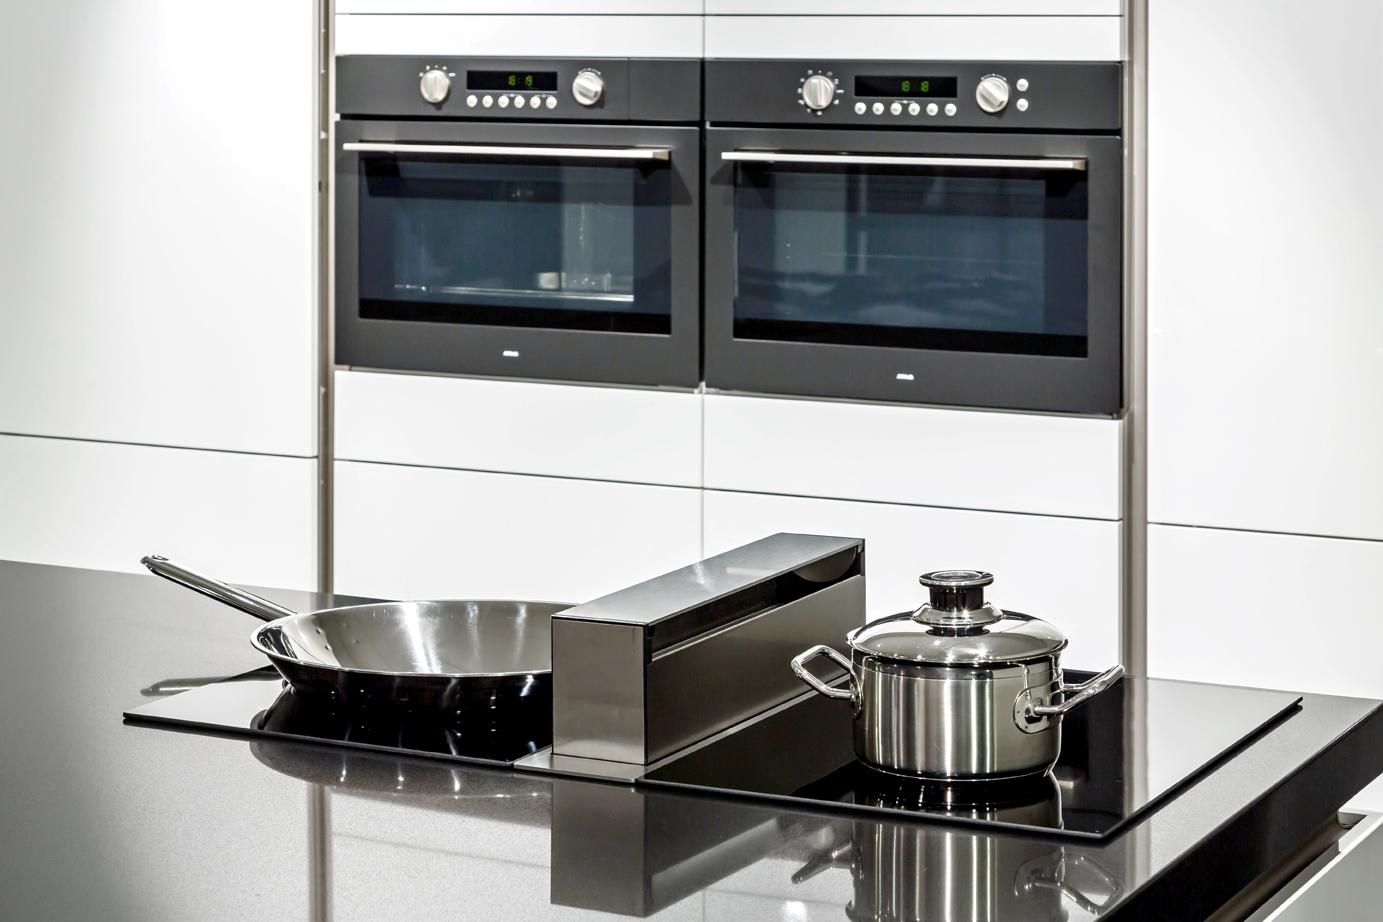 Keuken Apparatuur Merken : Keukenapparatuur kopen deskundig advies lage prijs db keukens